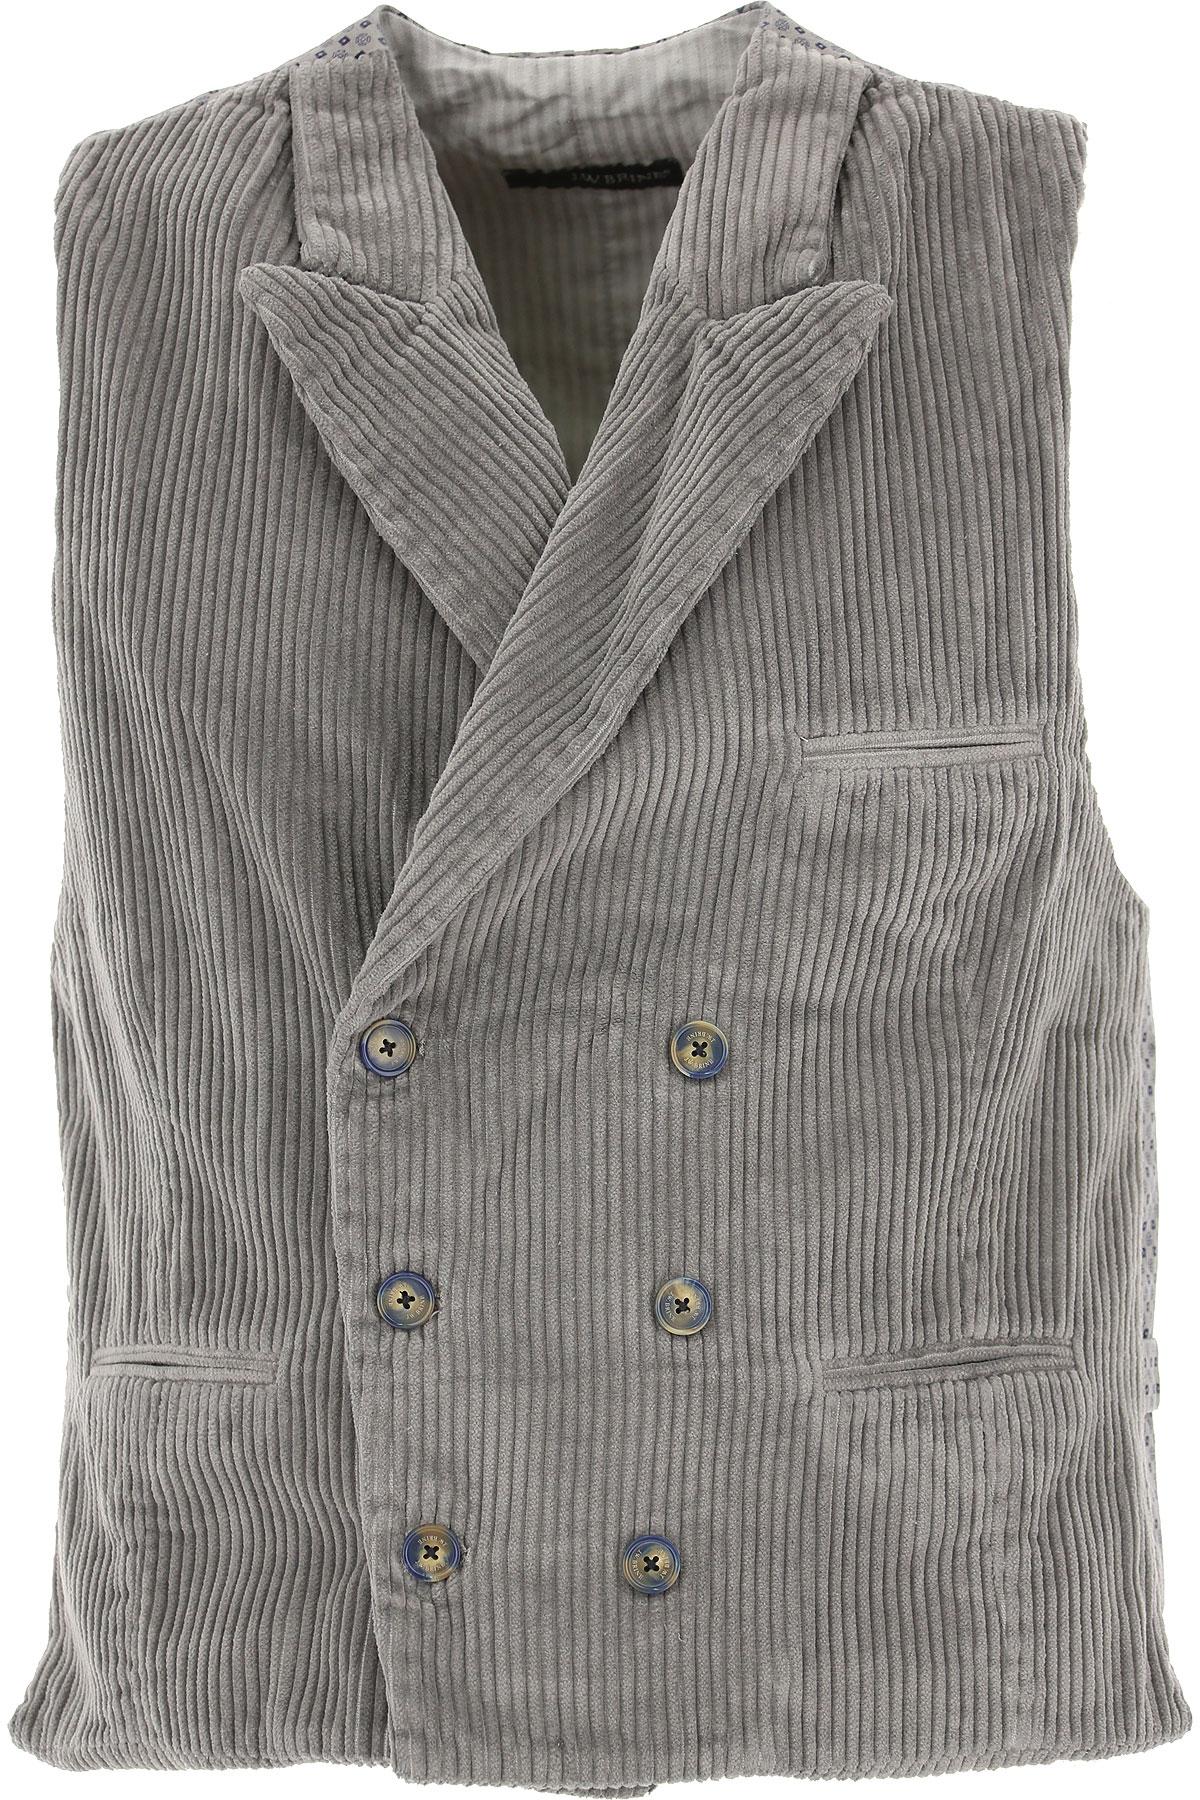 Image of J.W. Brine Mens Clothing, Ash, Cotton, 2017, L M XL